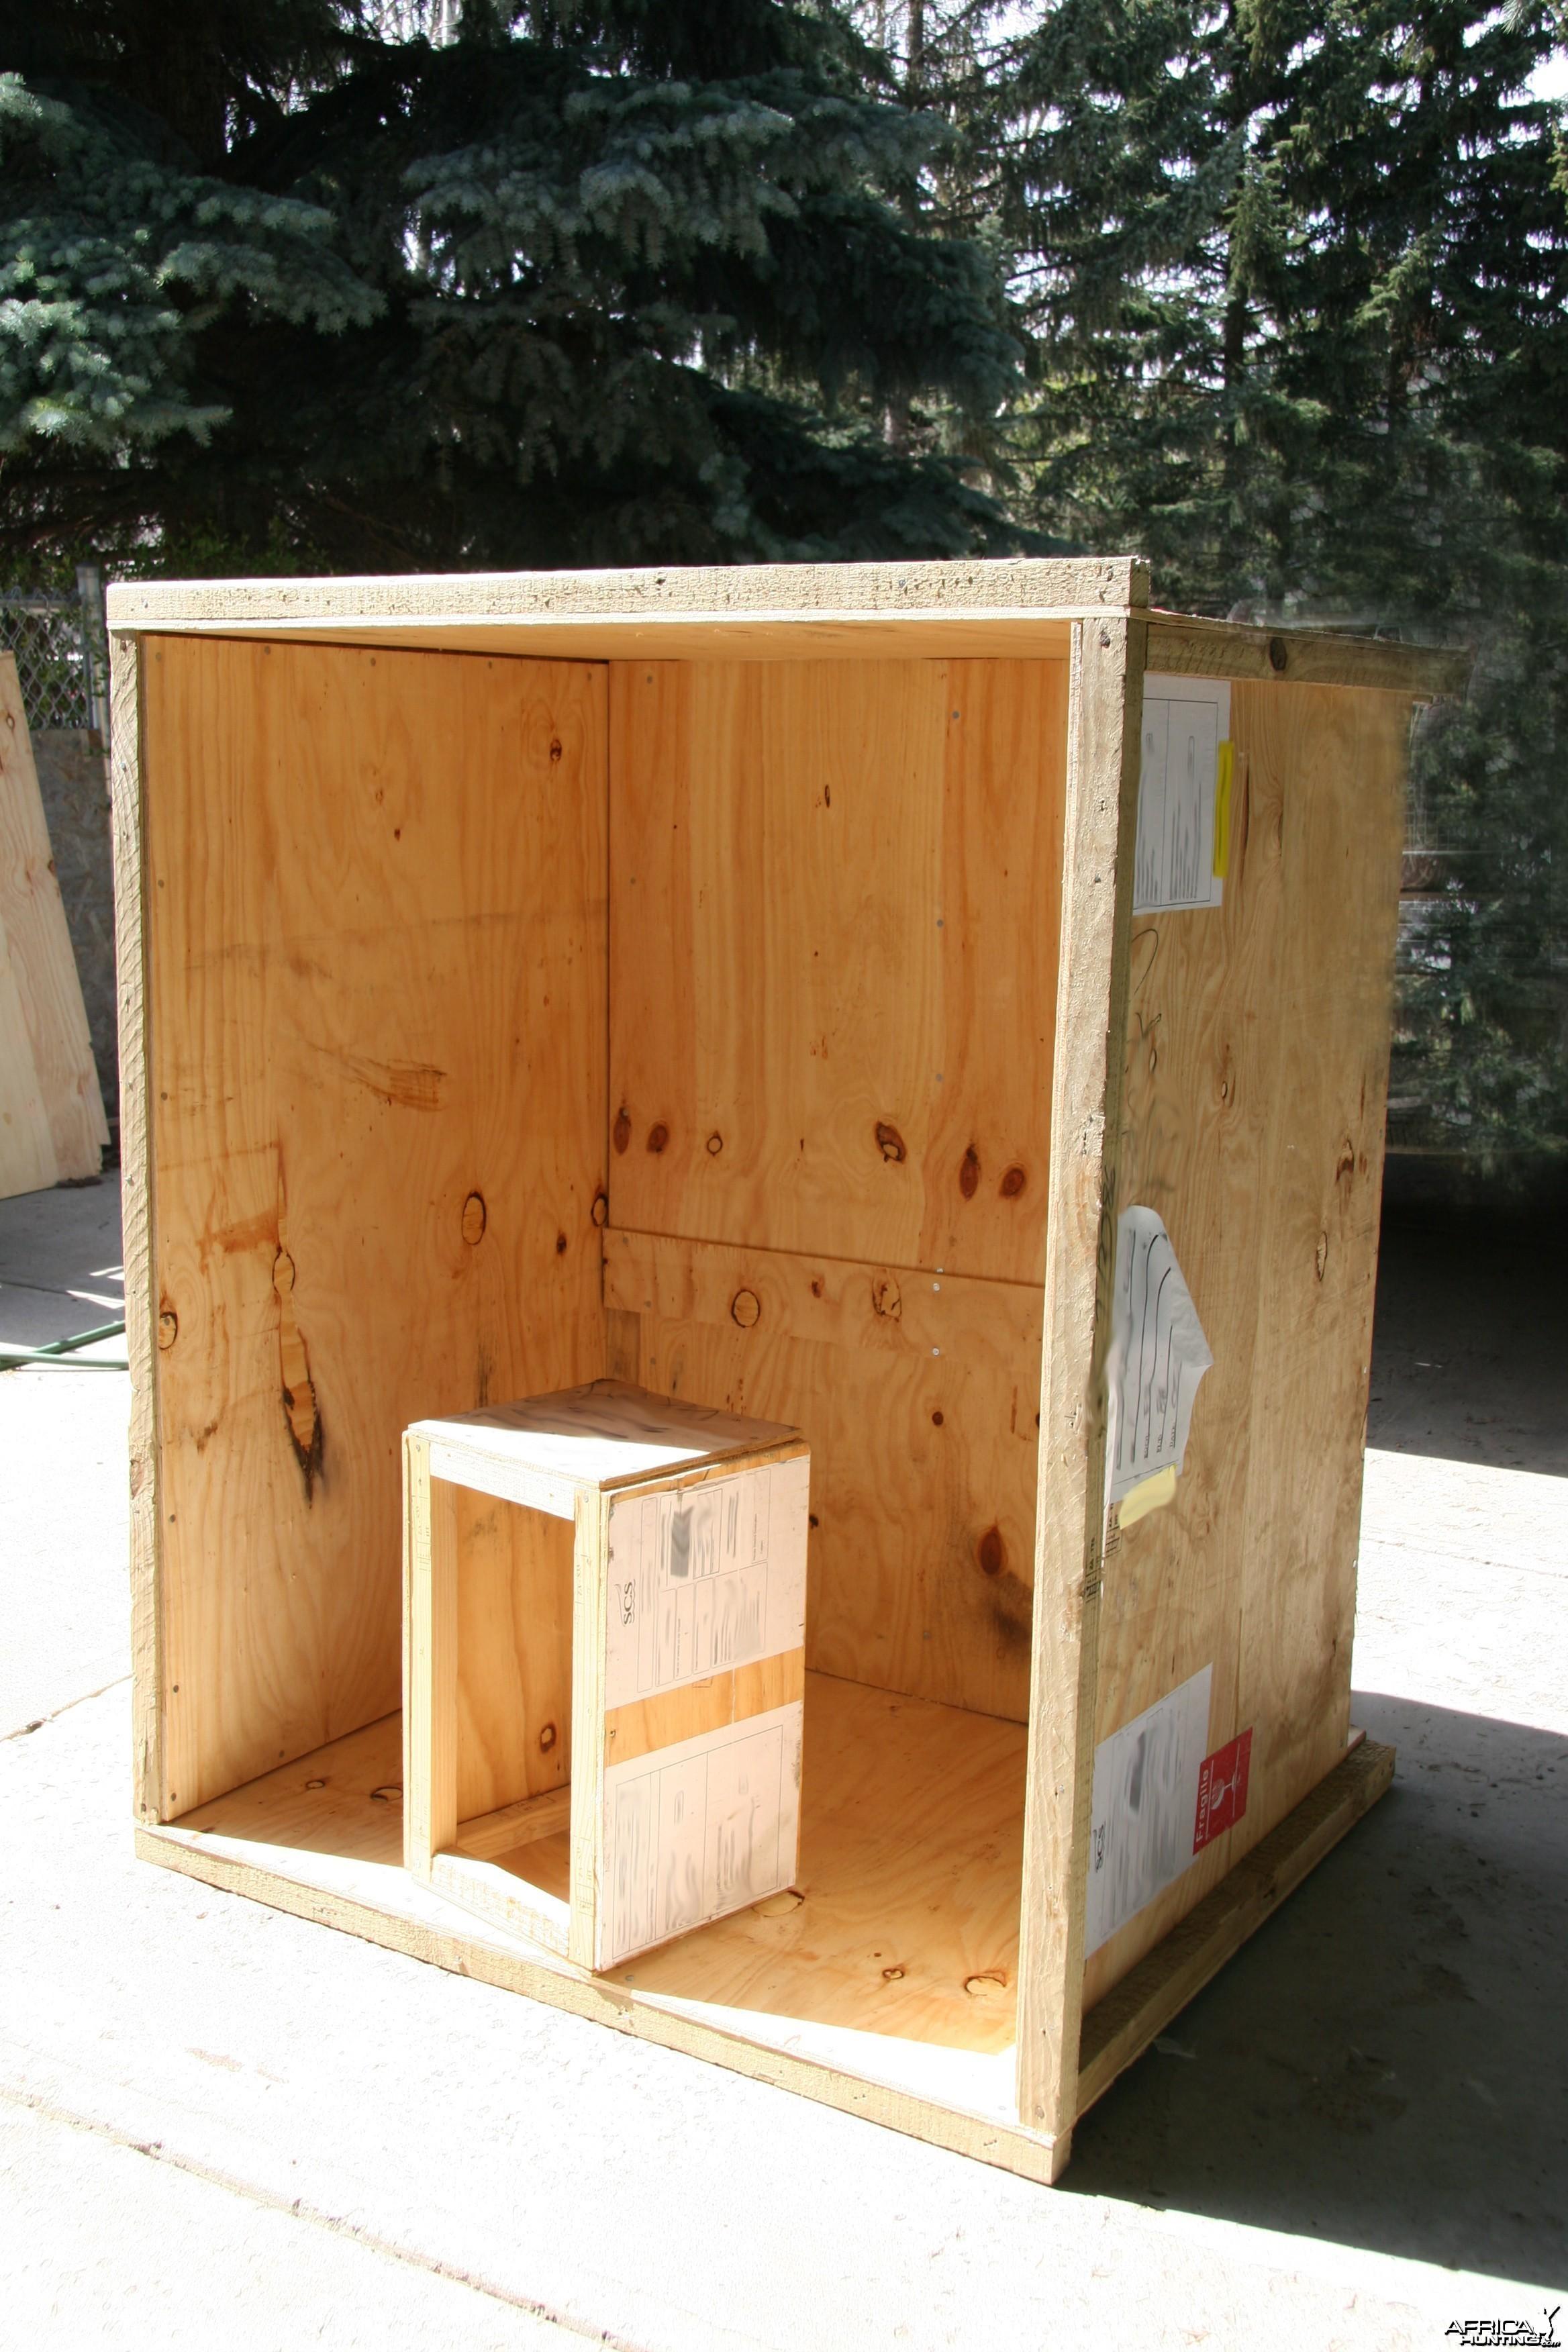 Trophy crates